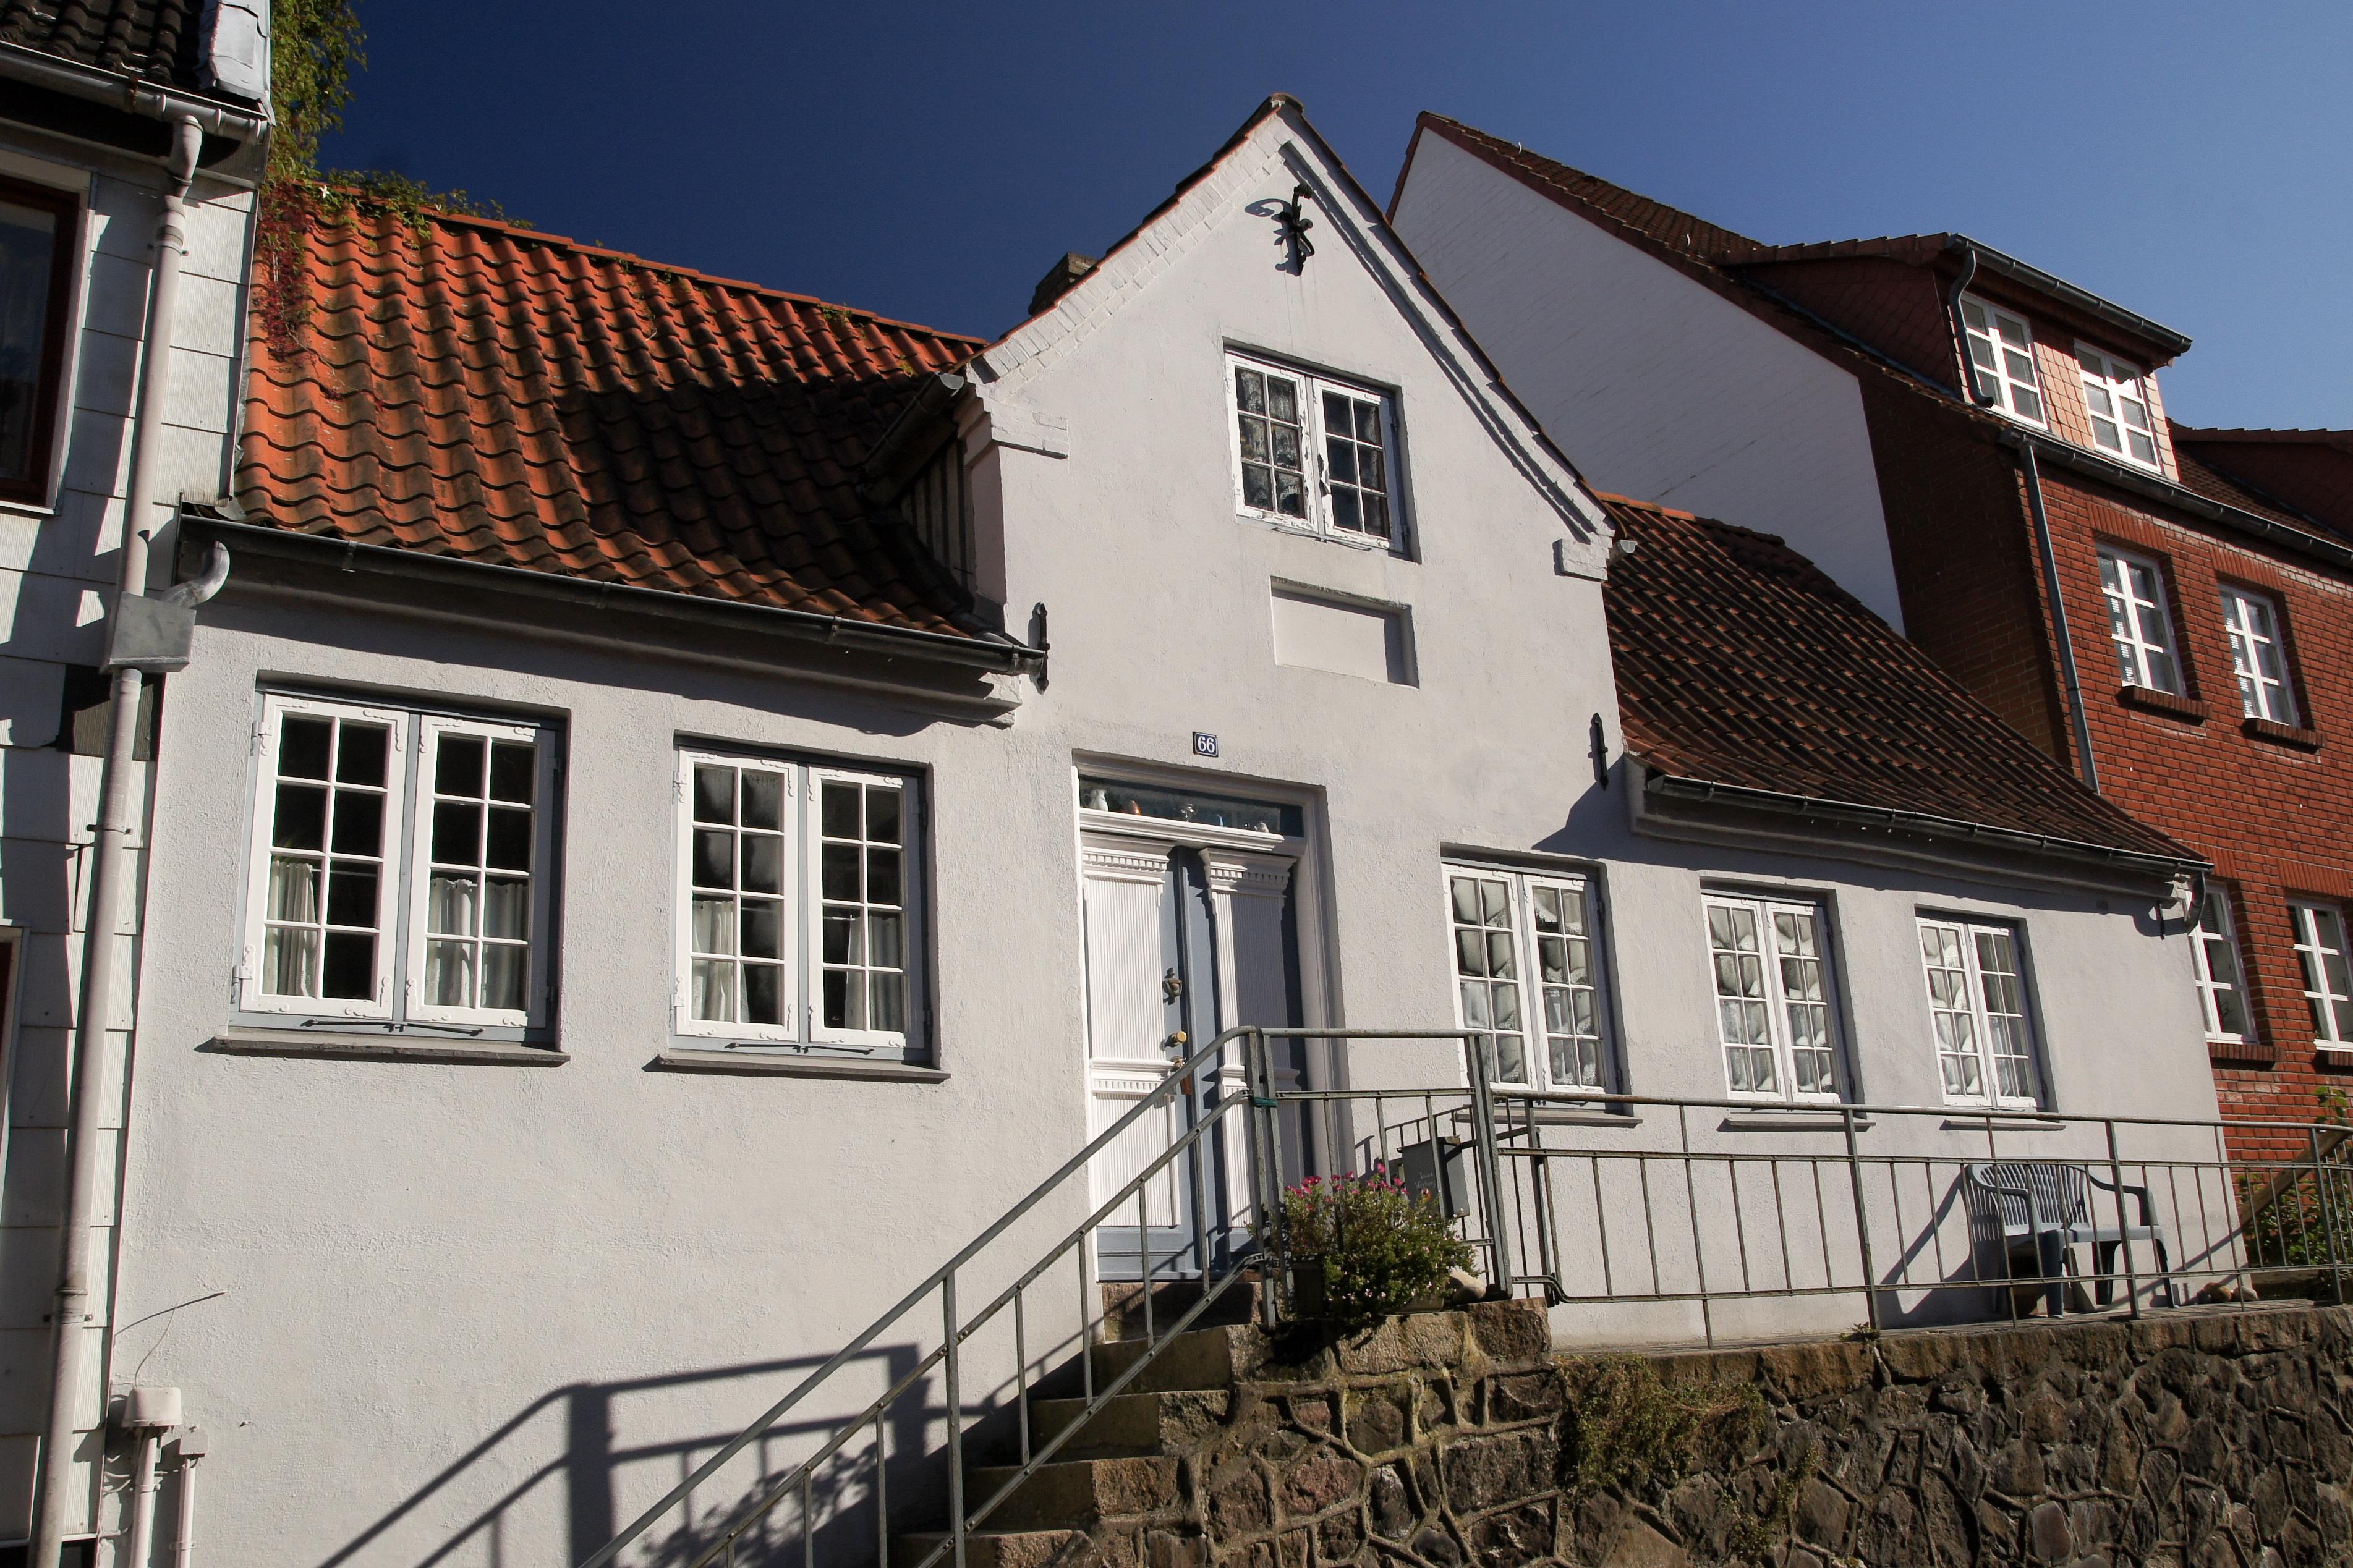 Datei:Johannisstr 66, Flensburg-Jürgensby.jpg - Wikipedia